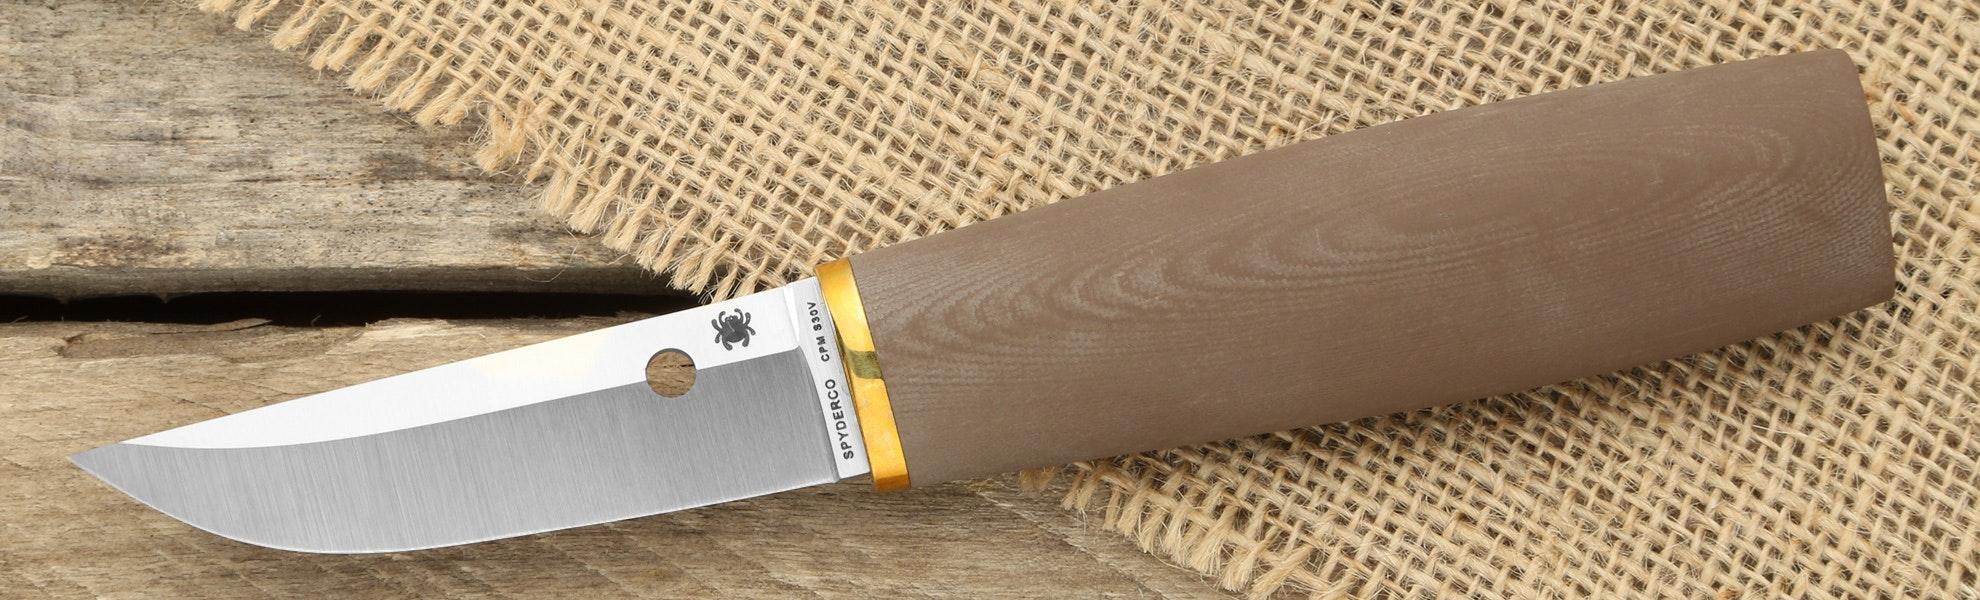 Spyderco Puukko Fixed Blade Knife